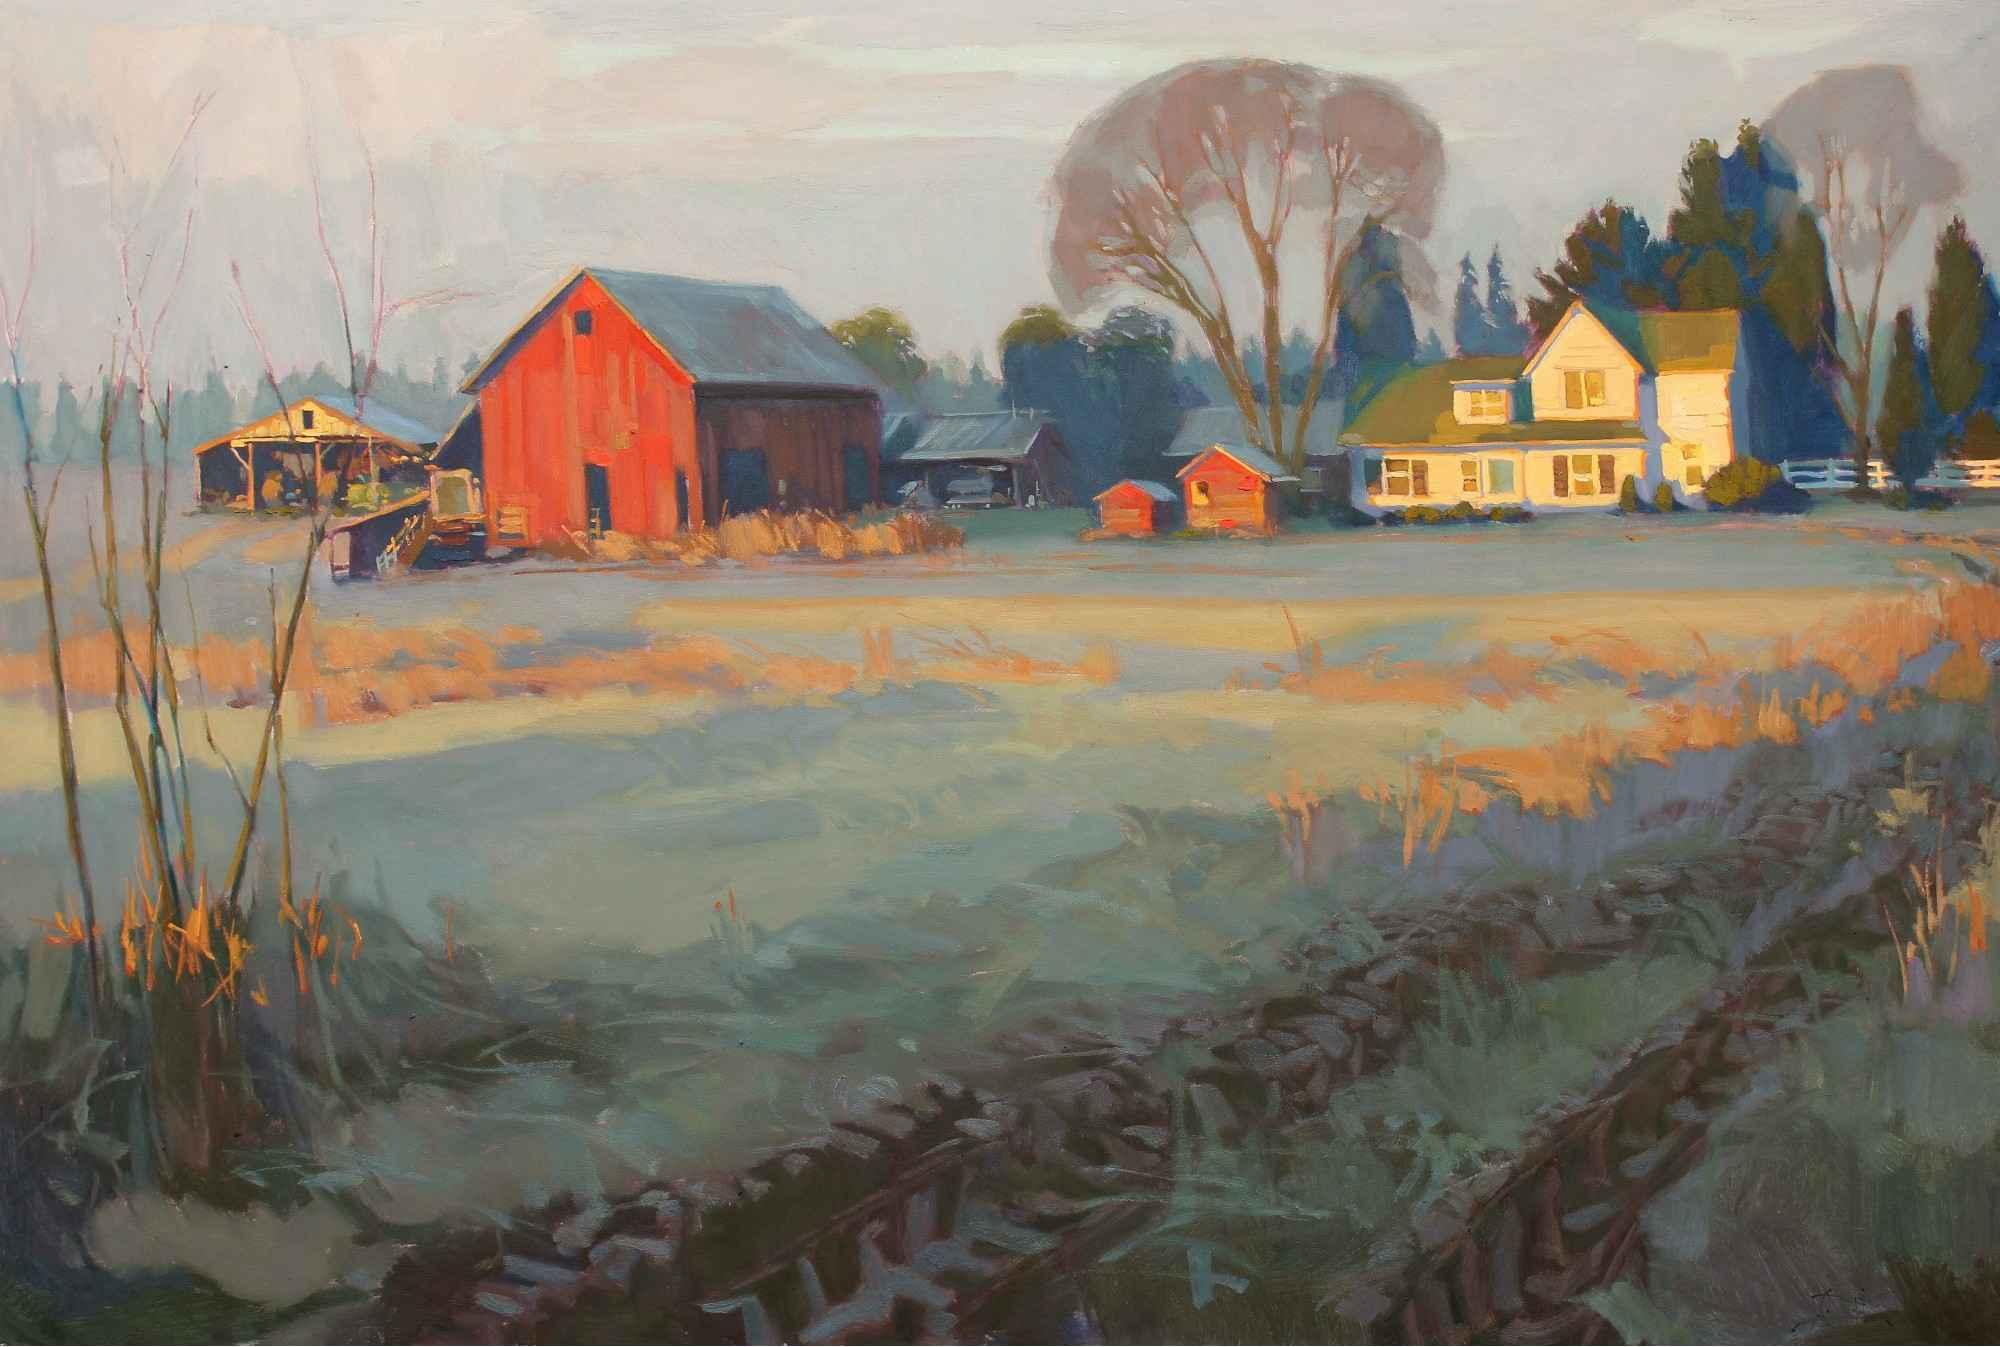 Cool Morning by  Jennifer Diehl - Masterpiece Online